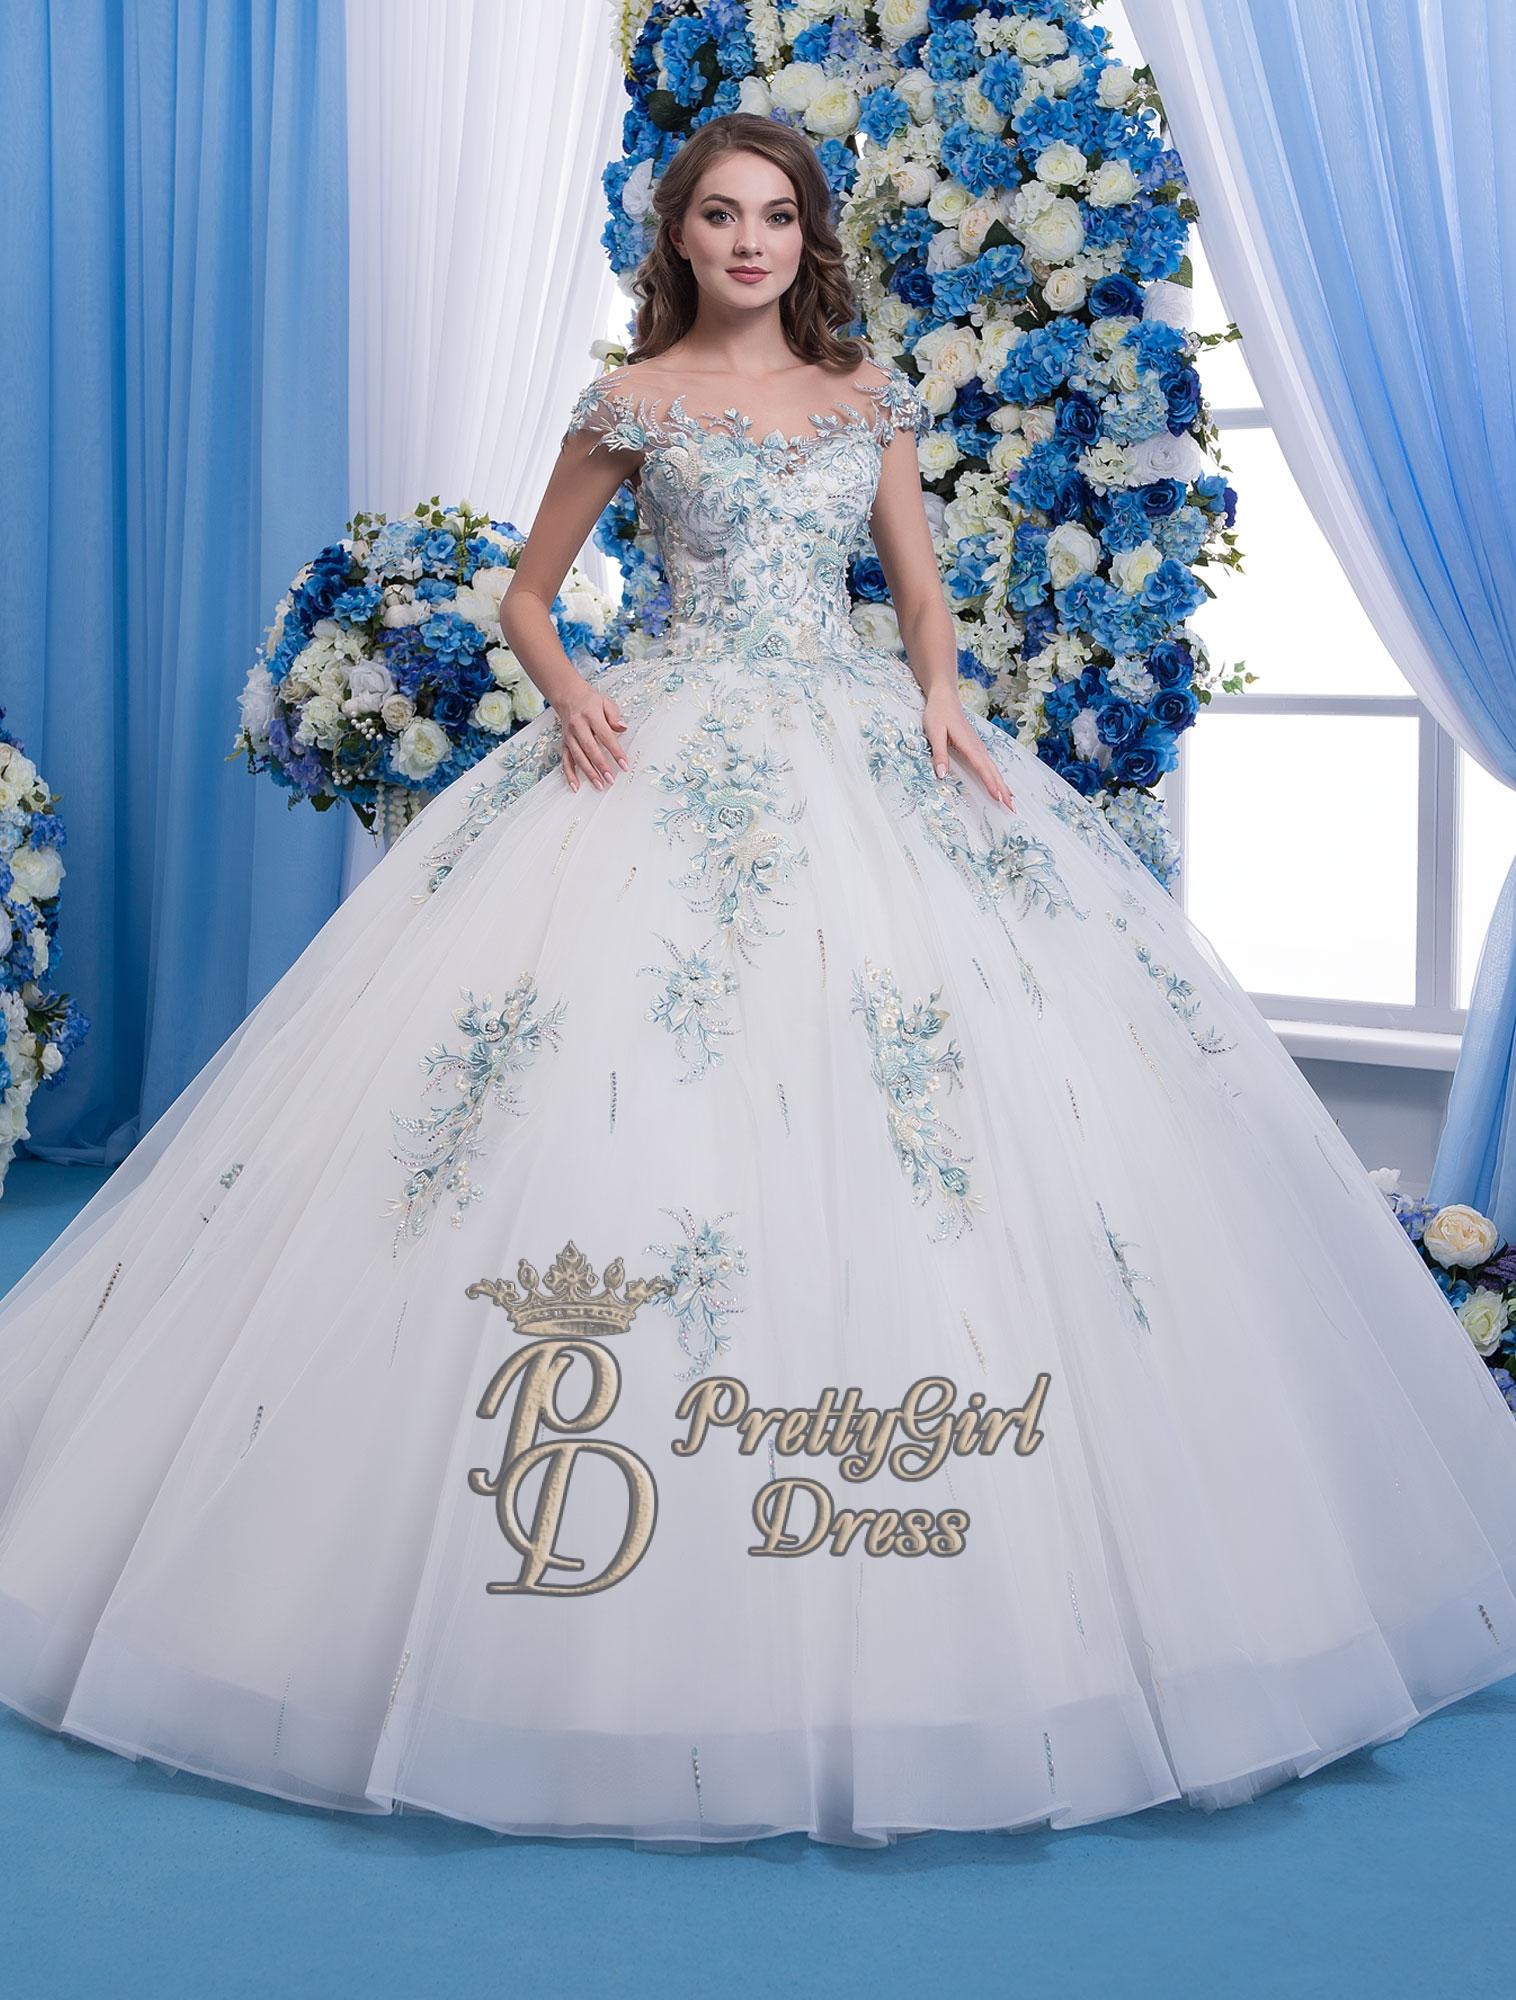 Vintage embroidered lace wedding dress cornflower